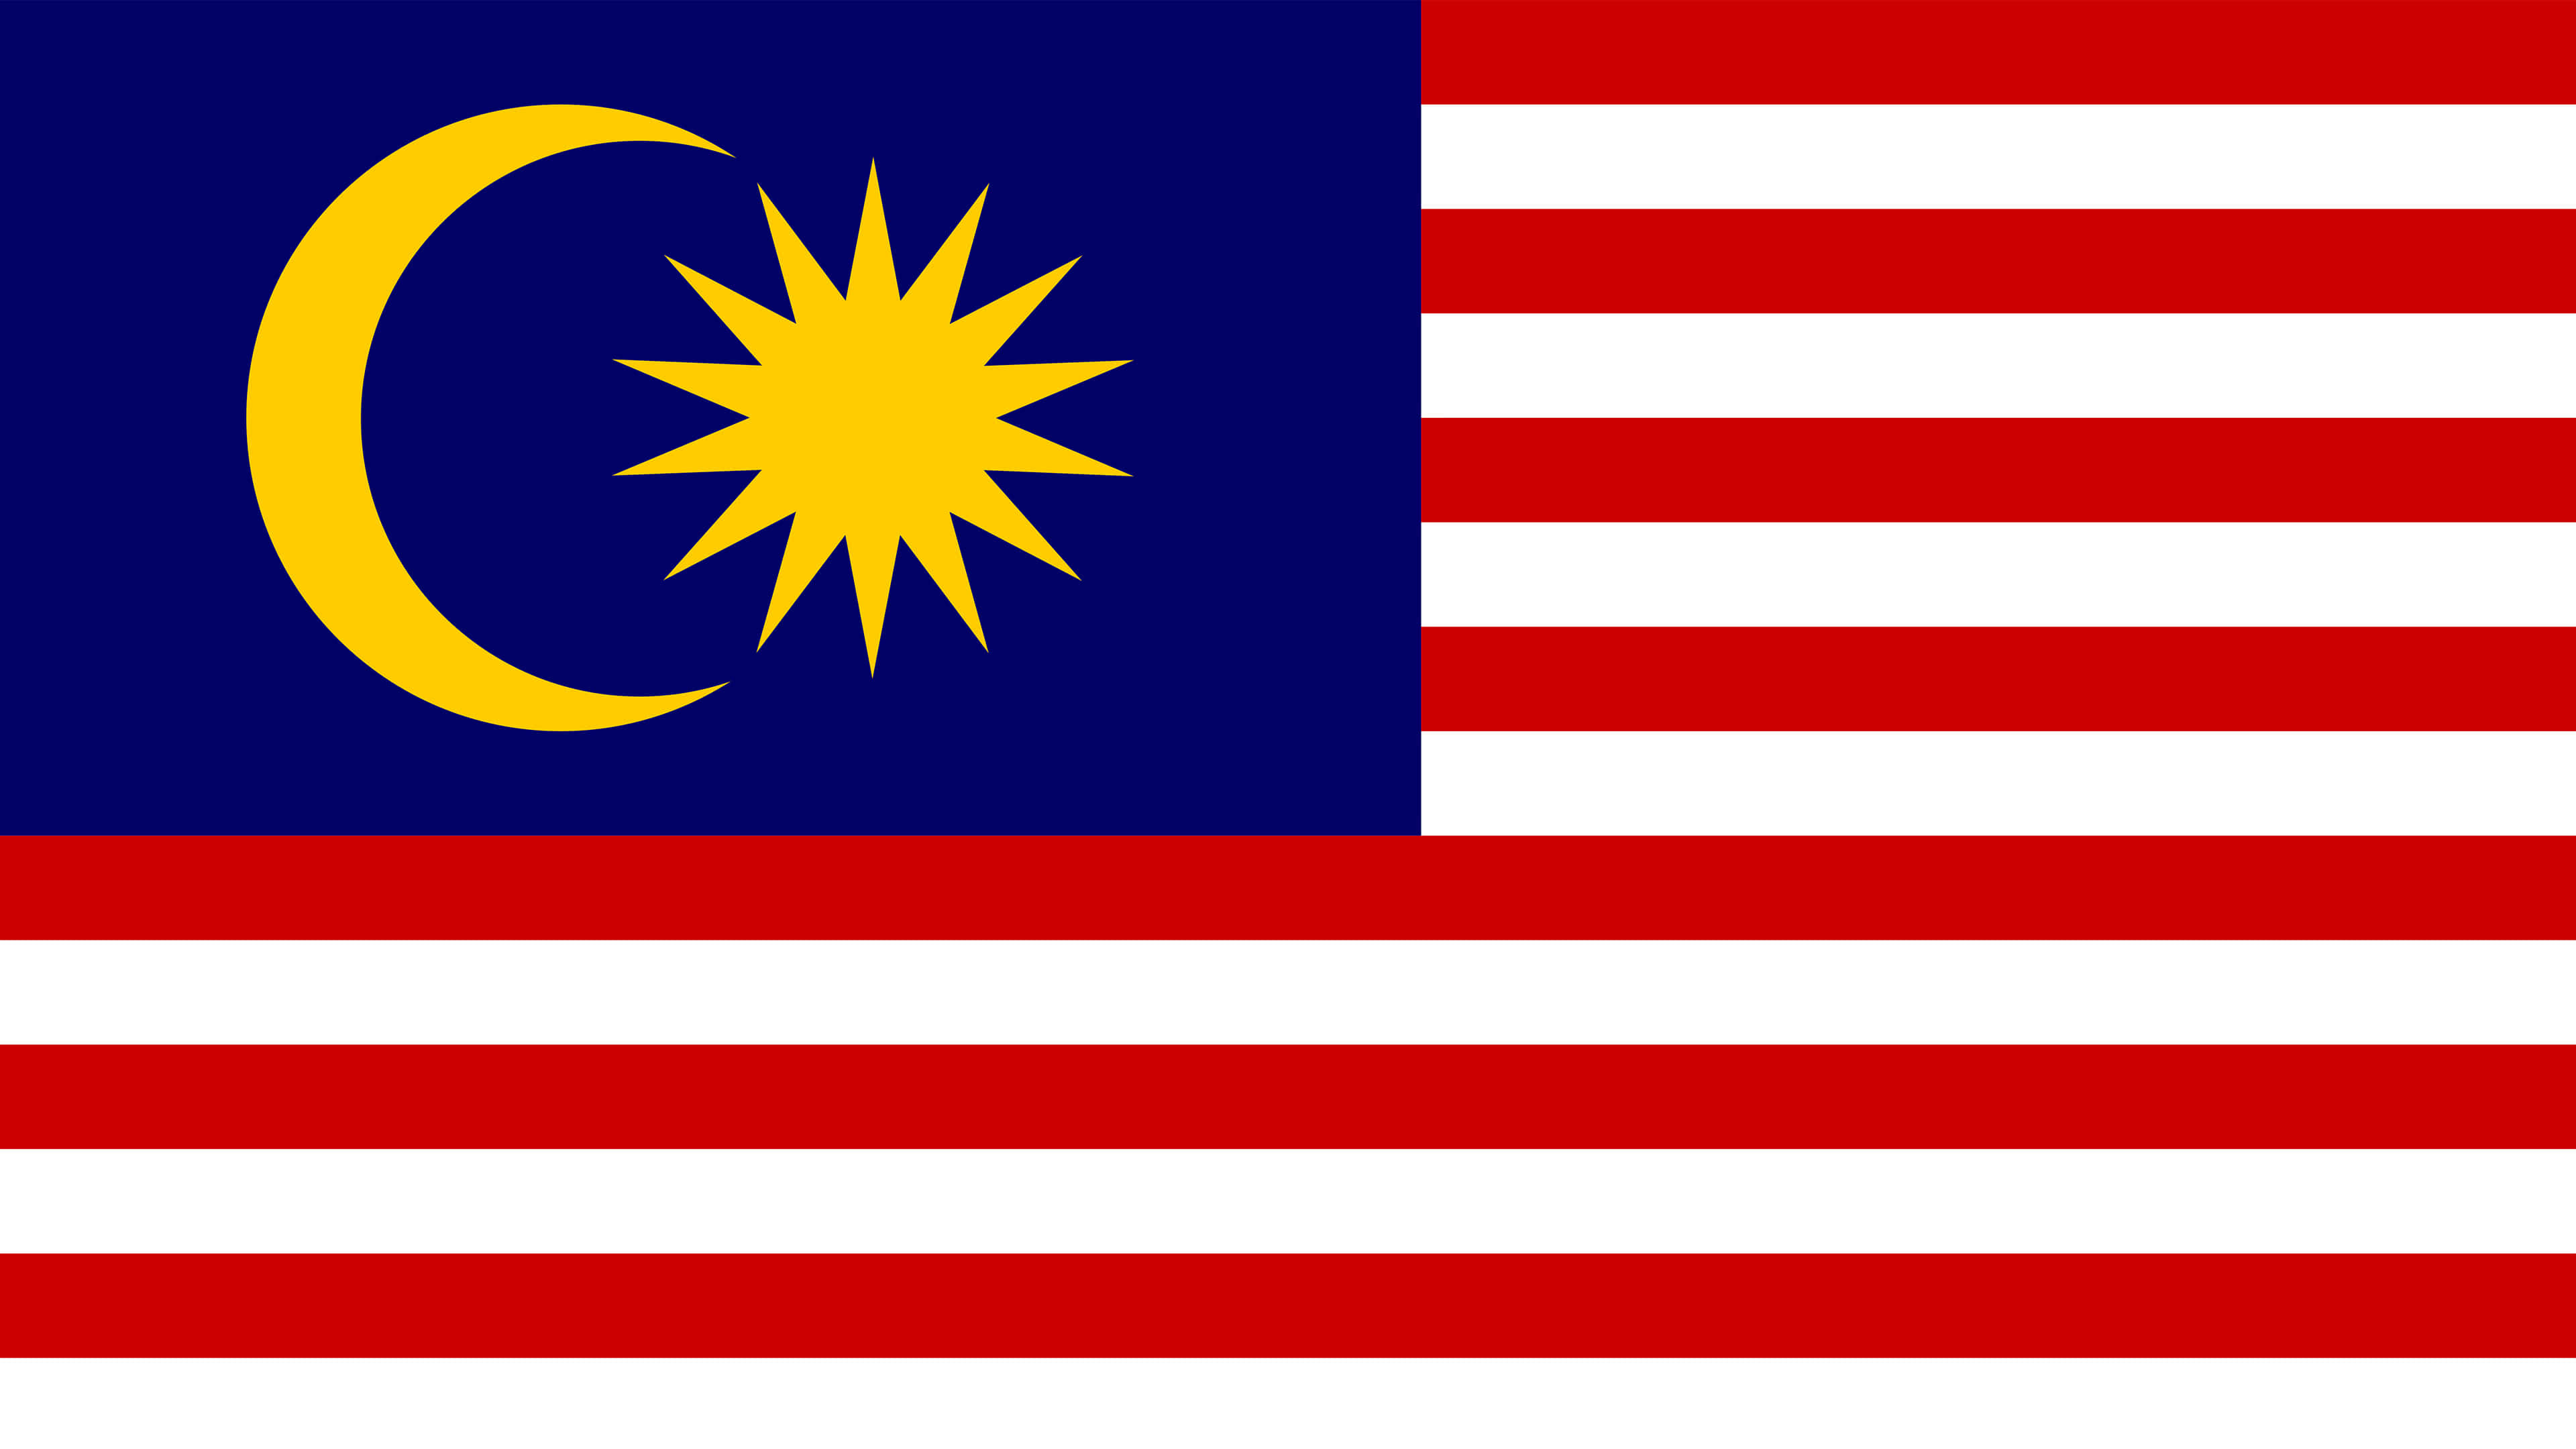 Malaysia Flag UHD 4K Wallpaper Pixelz 3840x2160